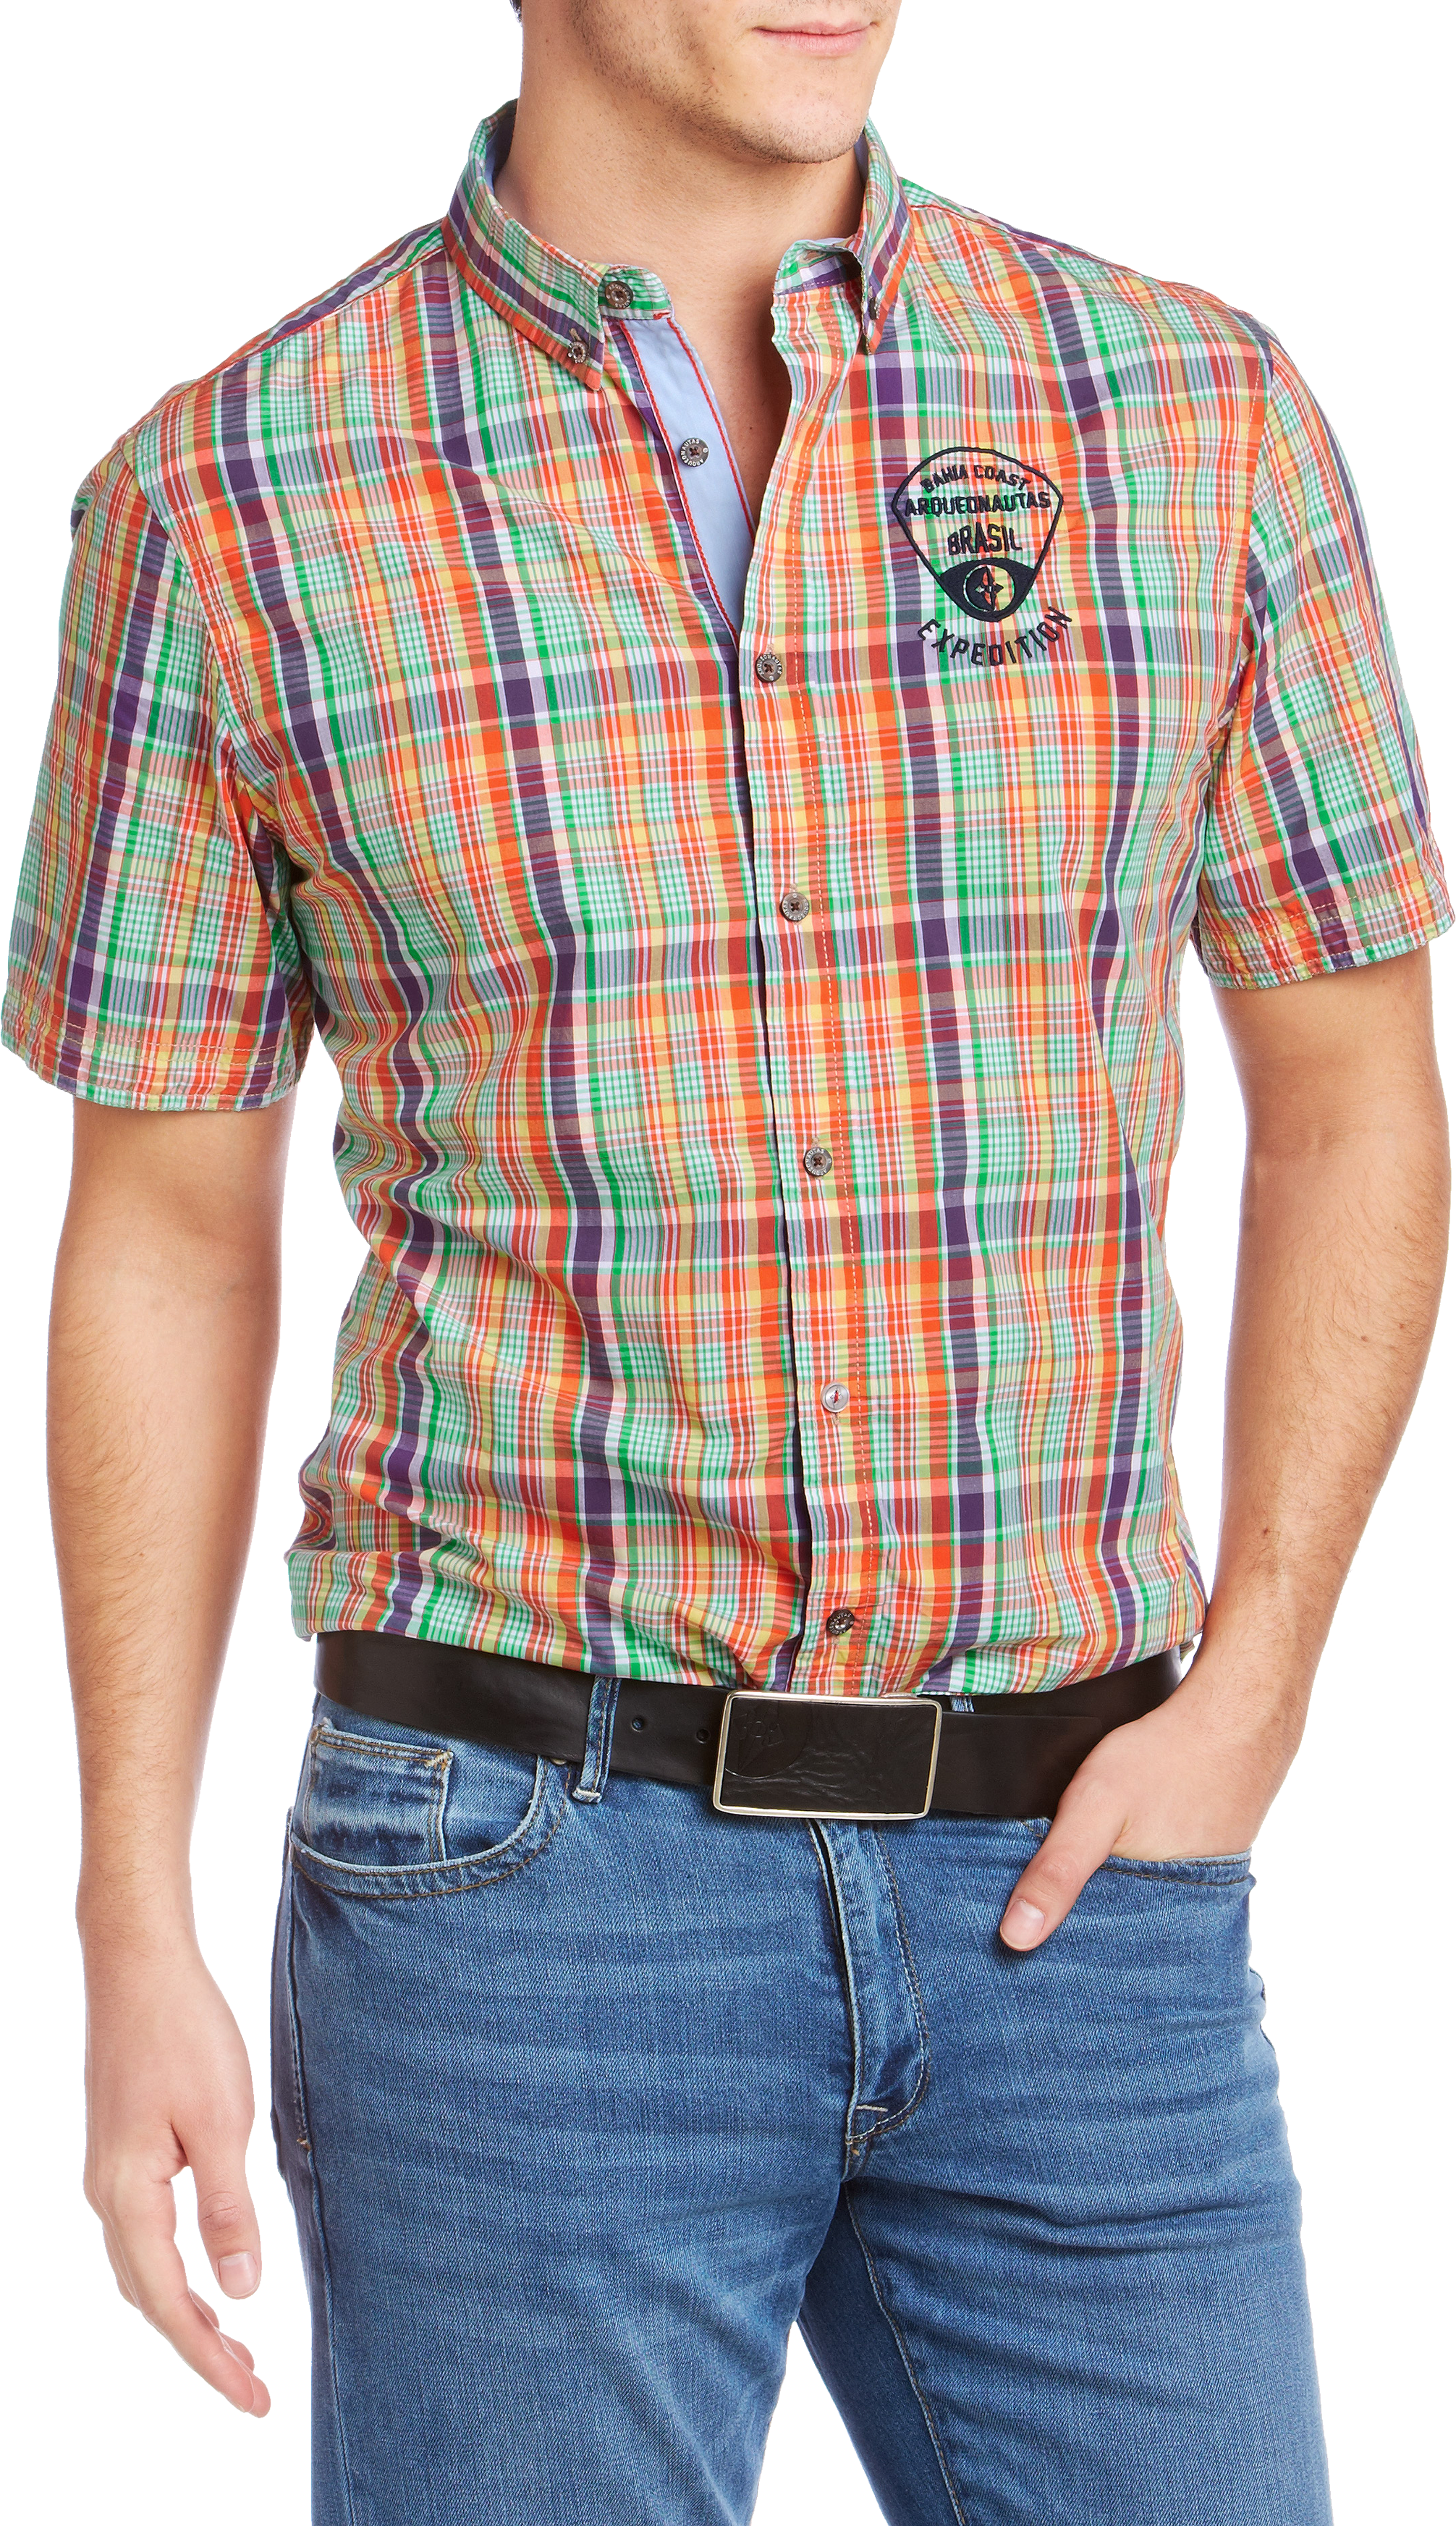 Clipart shirt mens shirt. Men polo png image